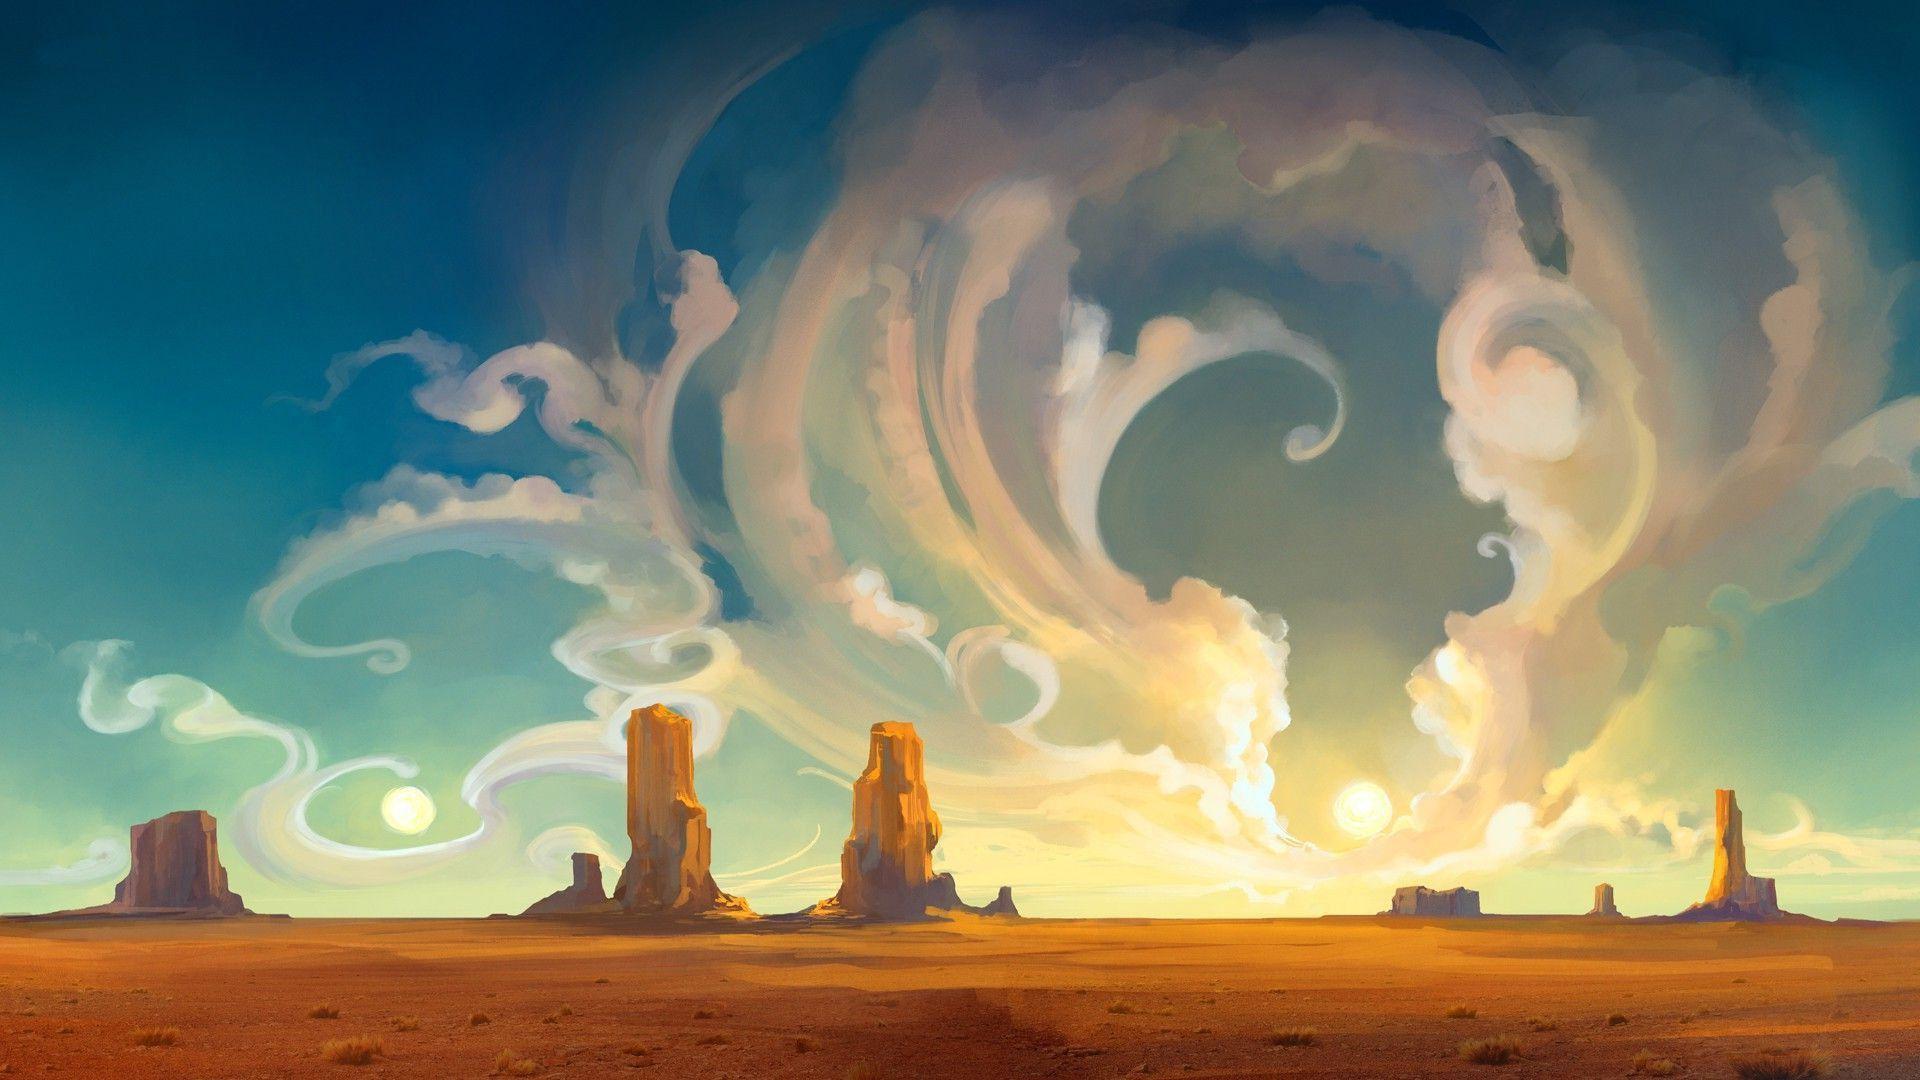 Artwork Concept Art Anime Landscape Canyon Fantasy Art Wallpapers Hd Desktop And Mobile Backgrounds Desert Art Environment Concept Art Art